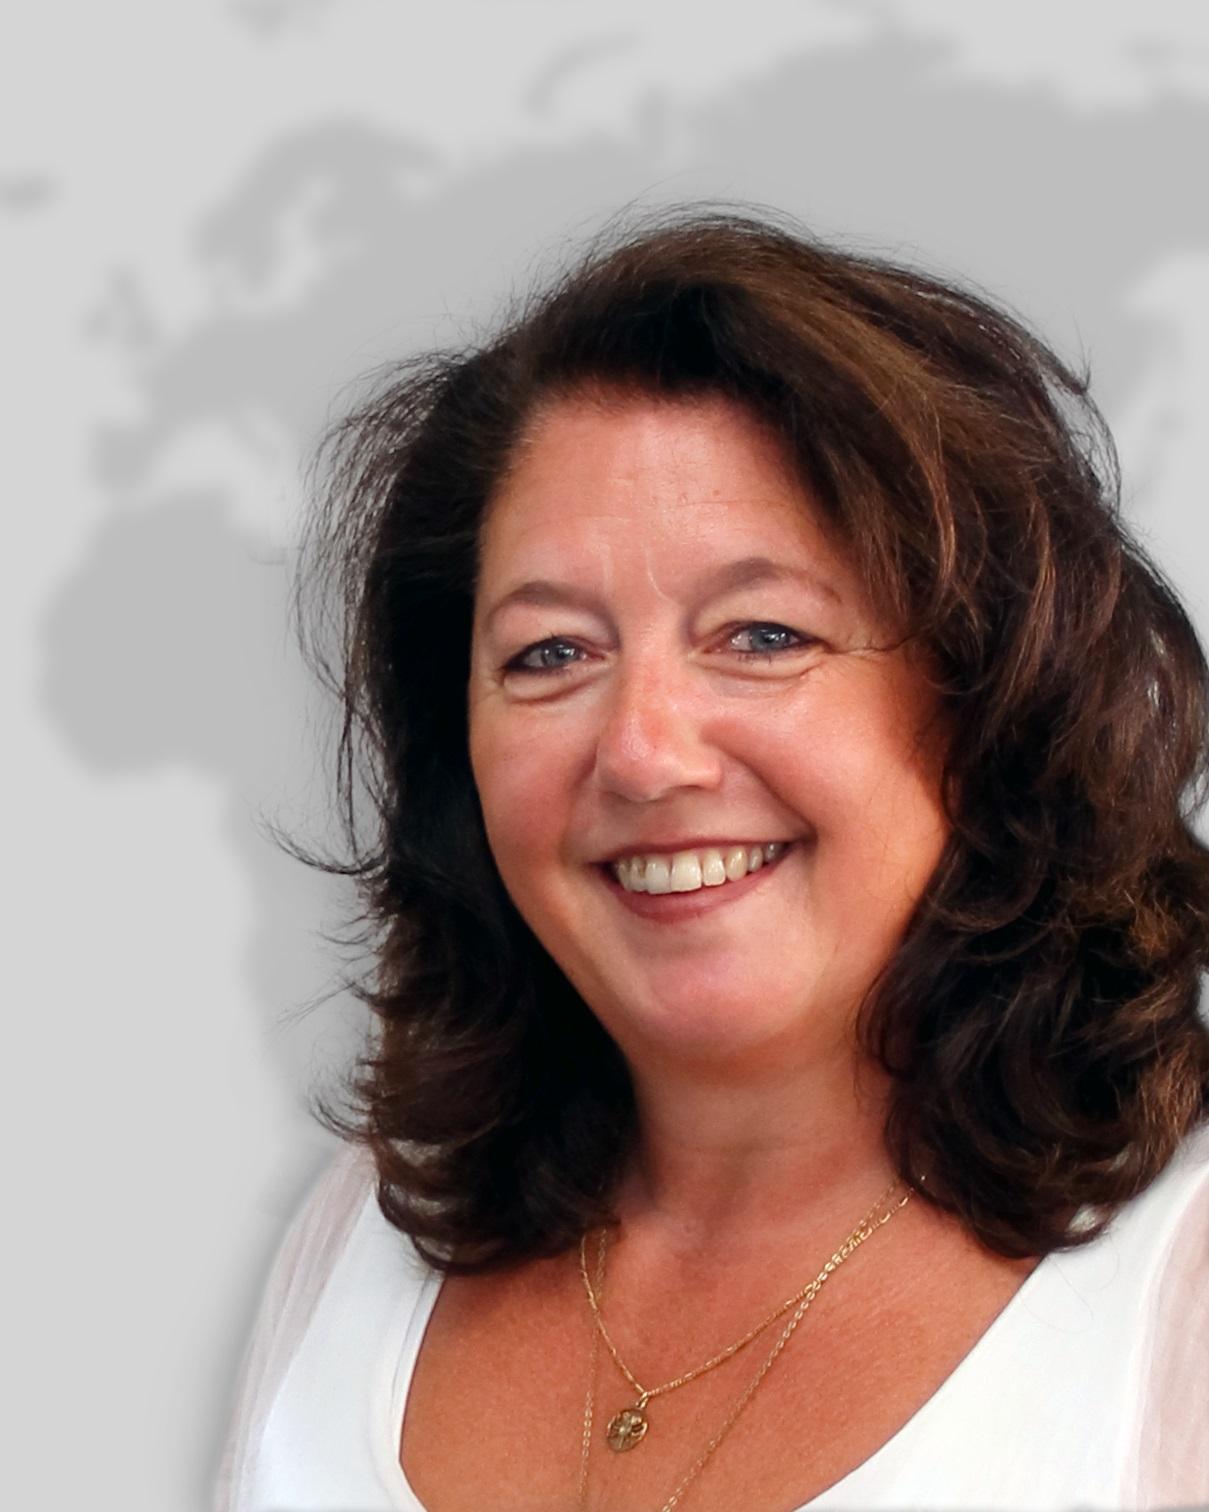 Annette Ziehn